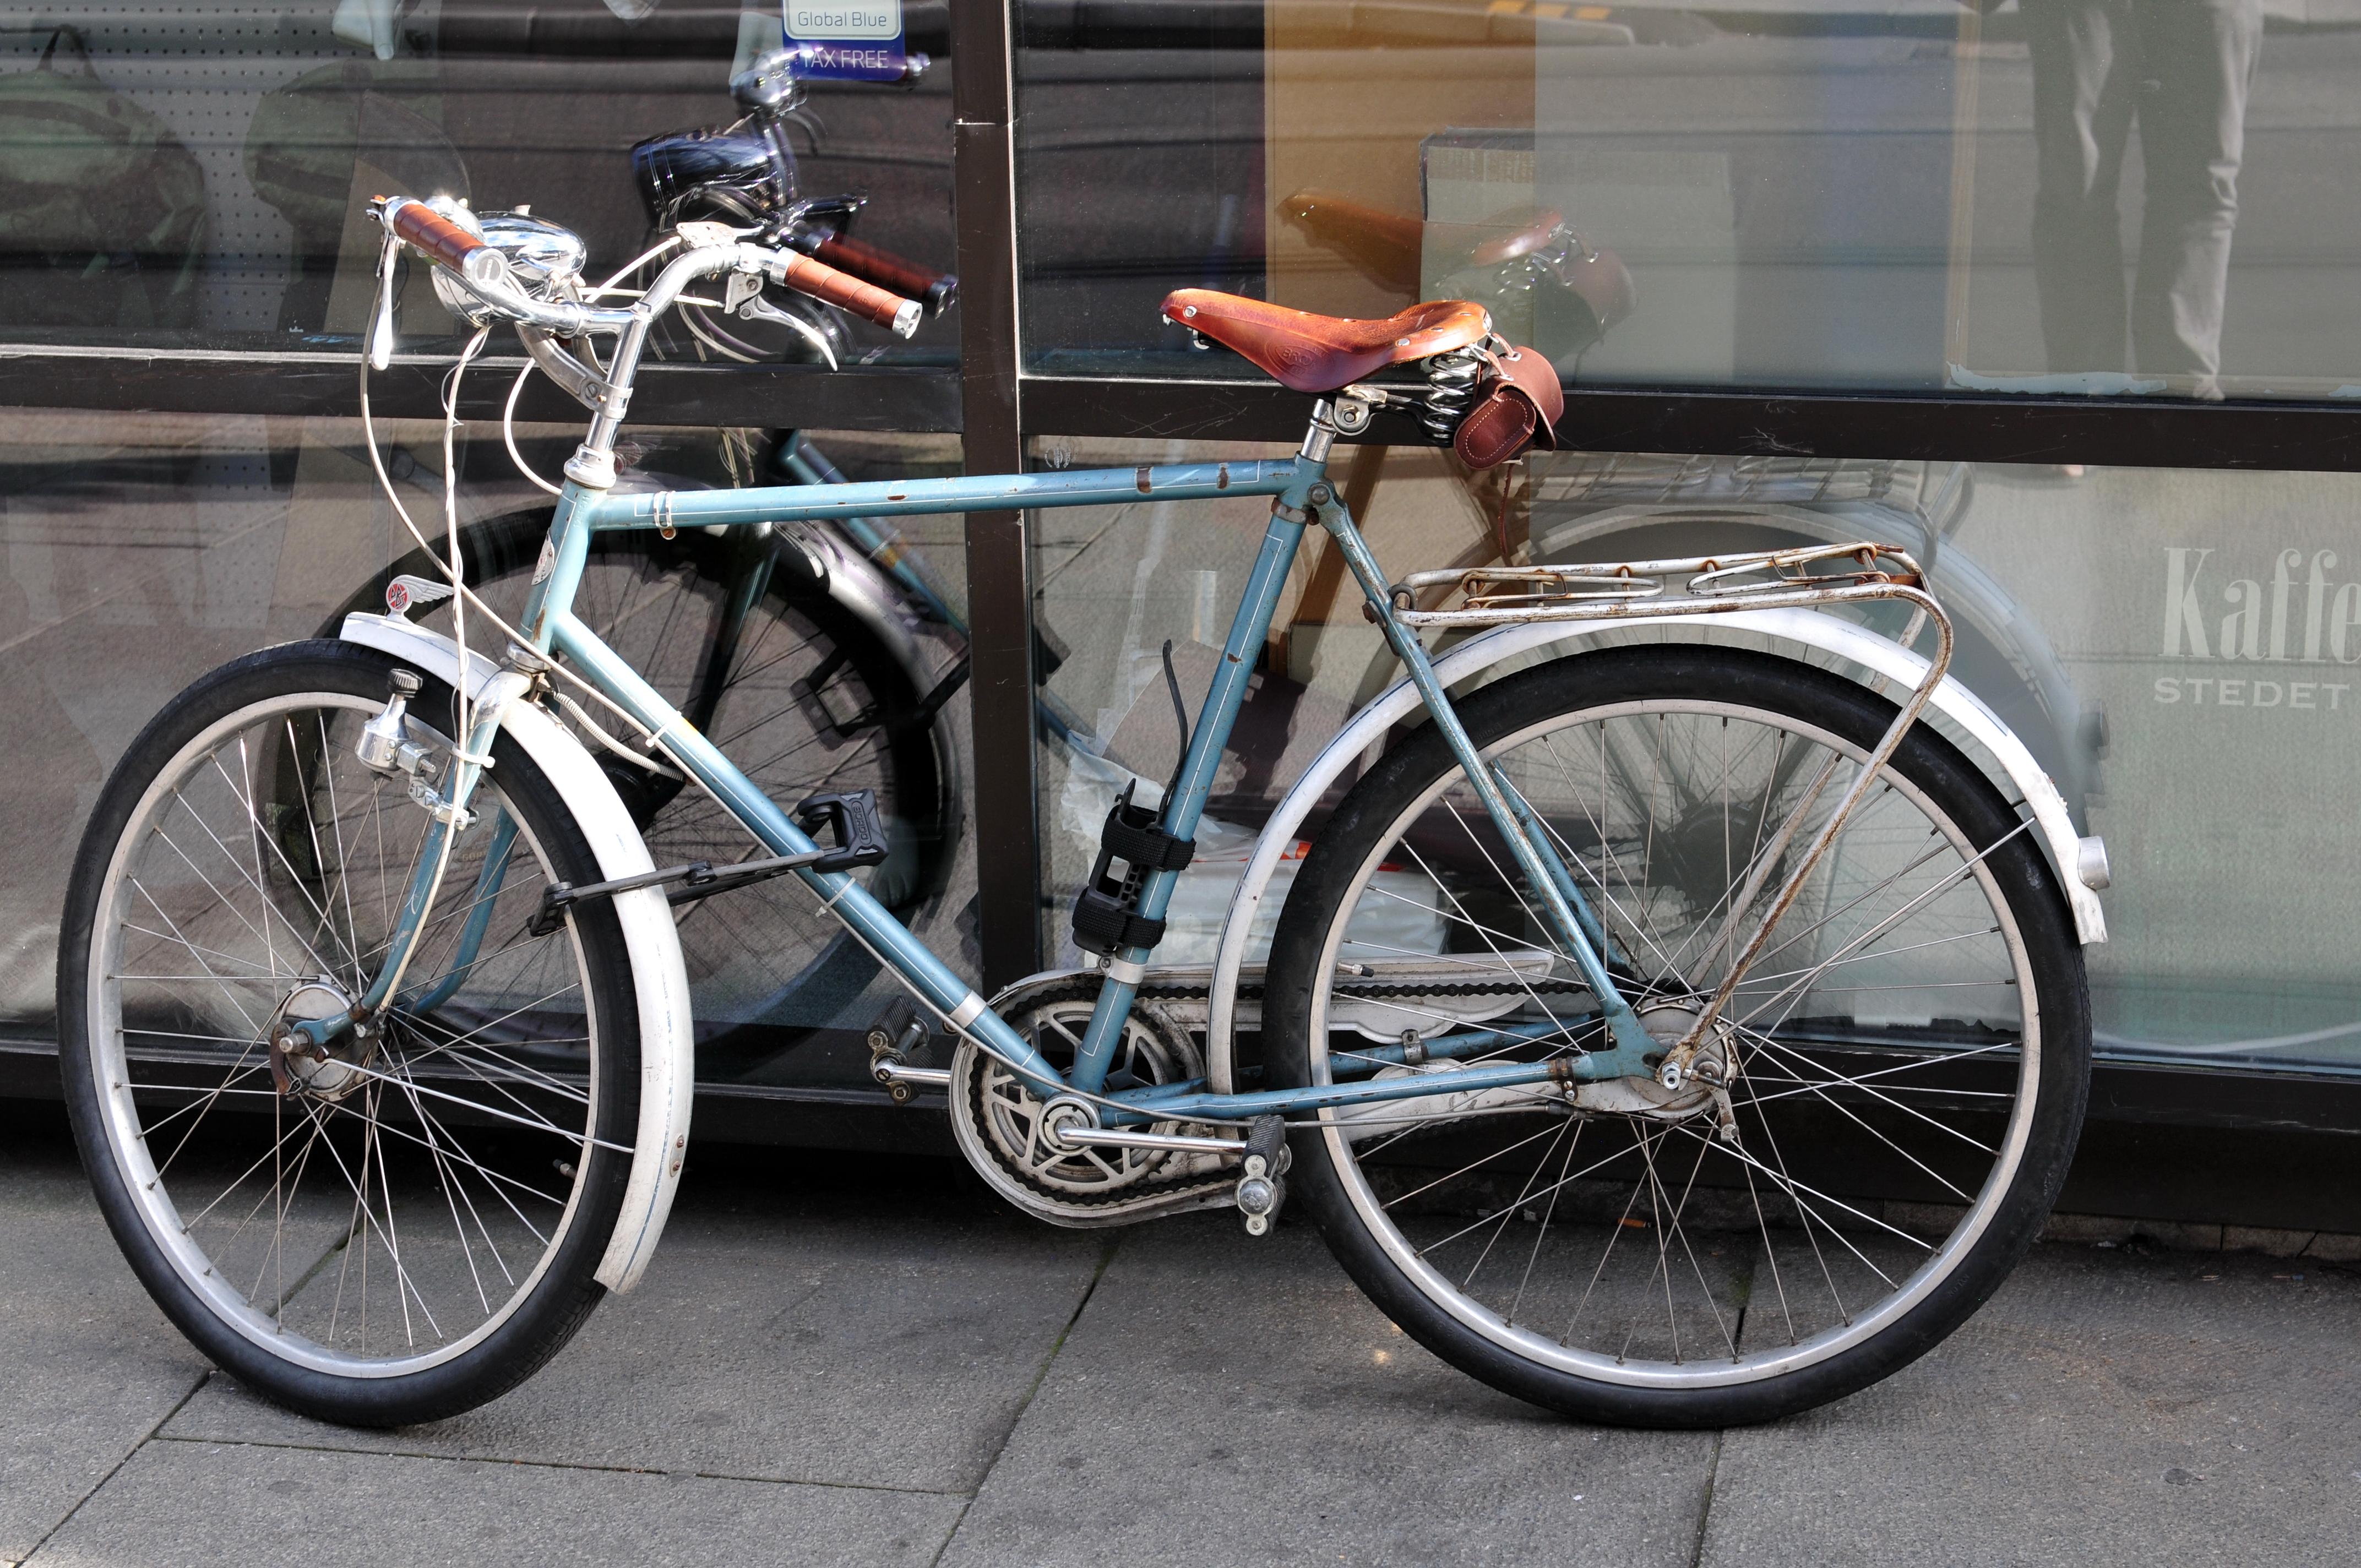 14-09-02-fahrrad-oslo-44.jpg